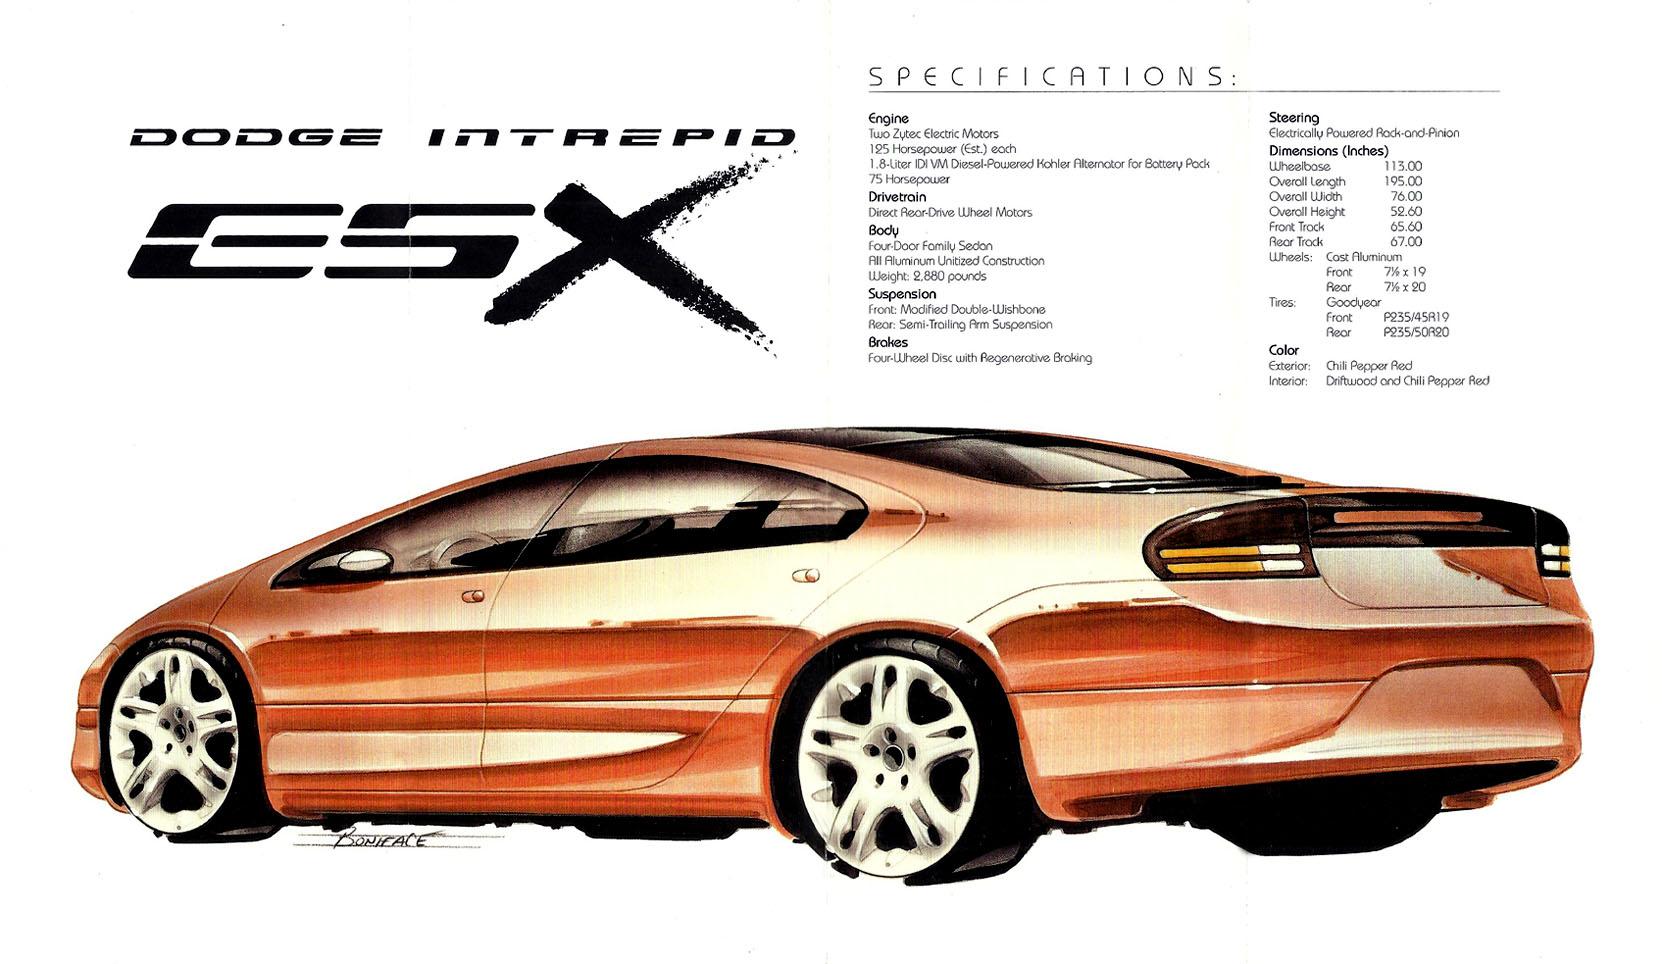 1996 Dodge Intrepid ESX - Concepts